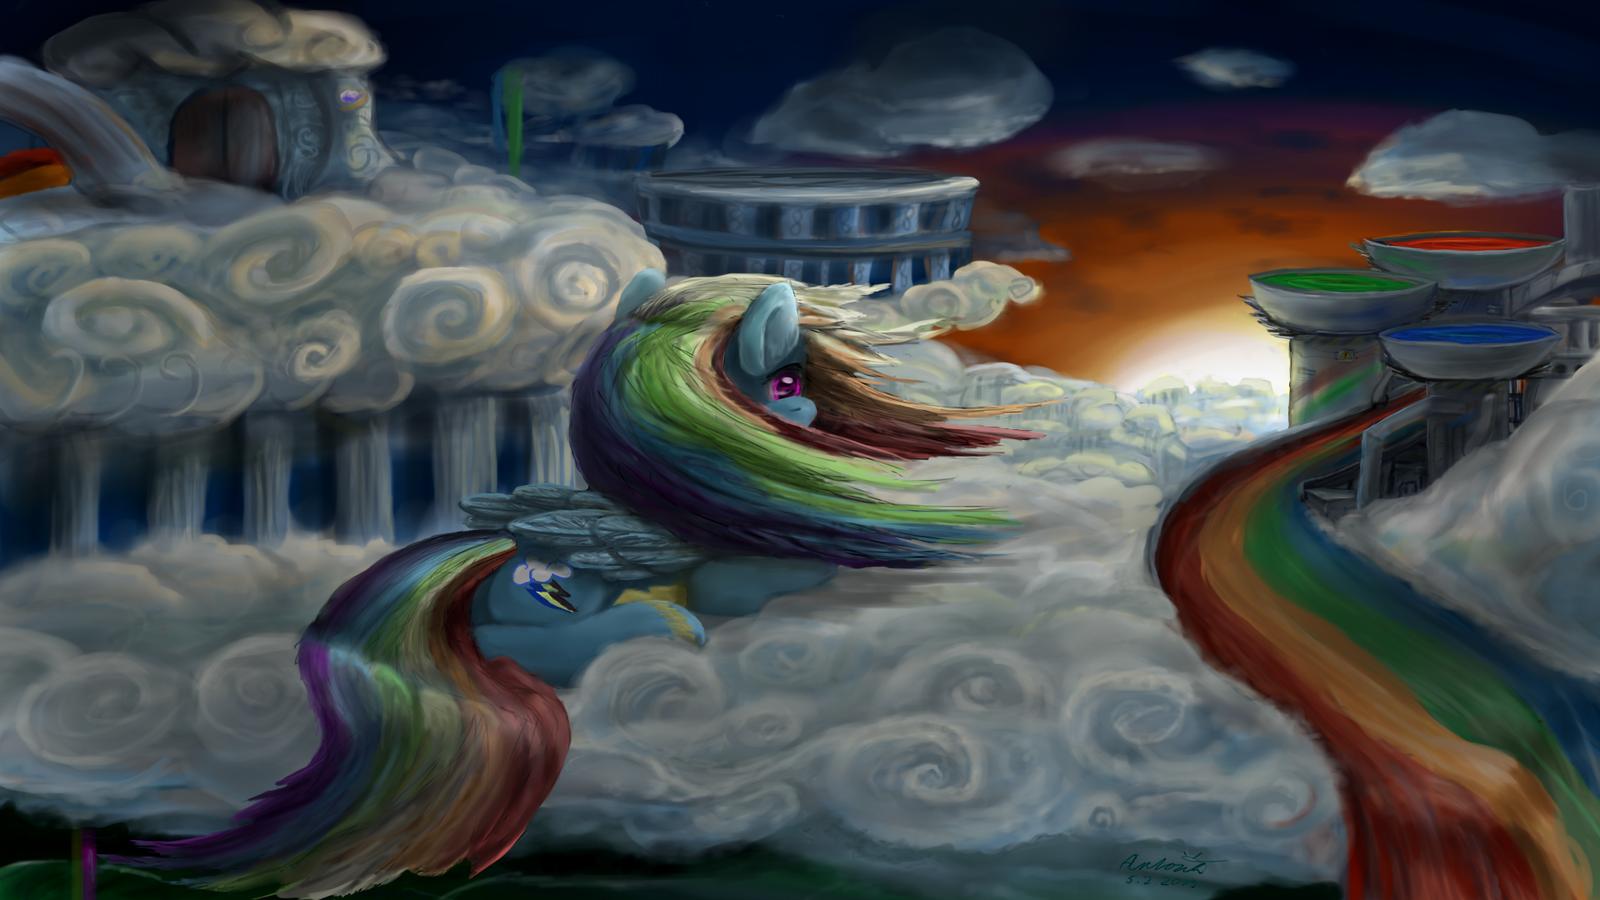 Dream come true by anttosik